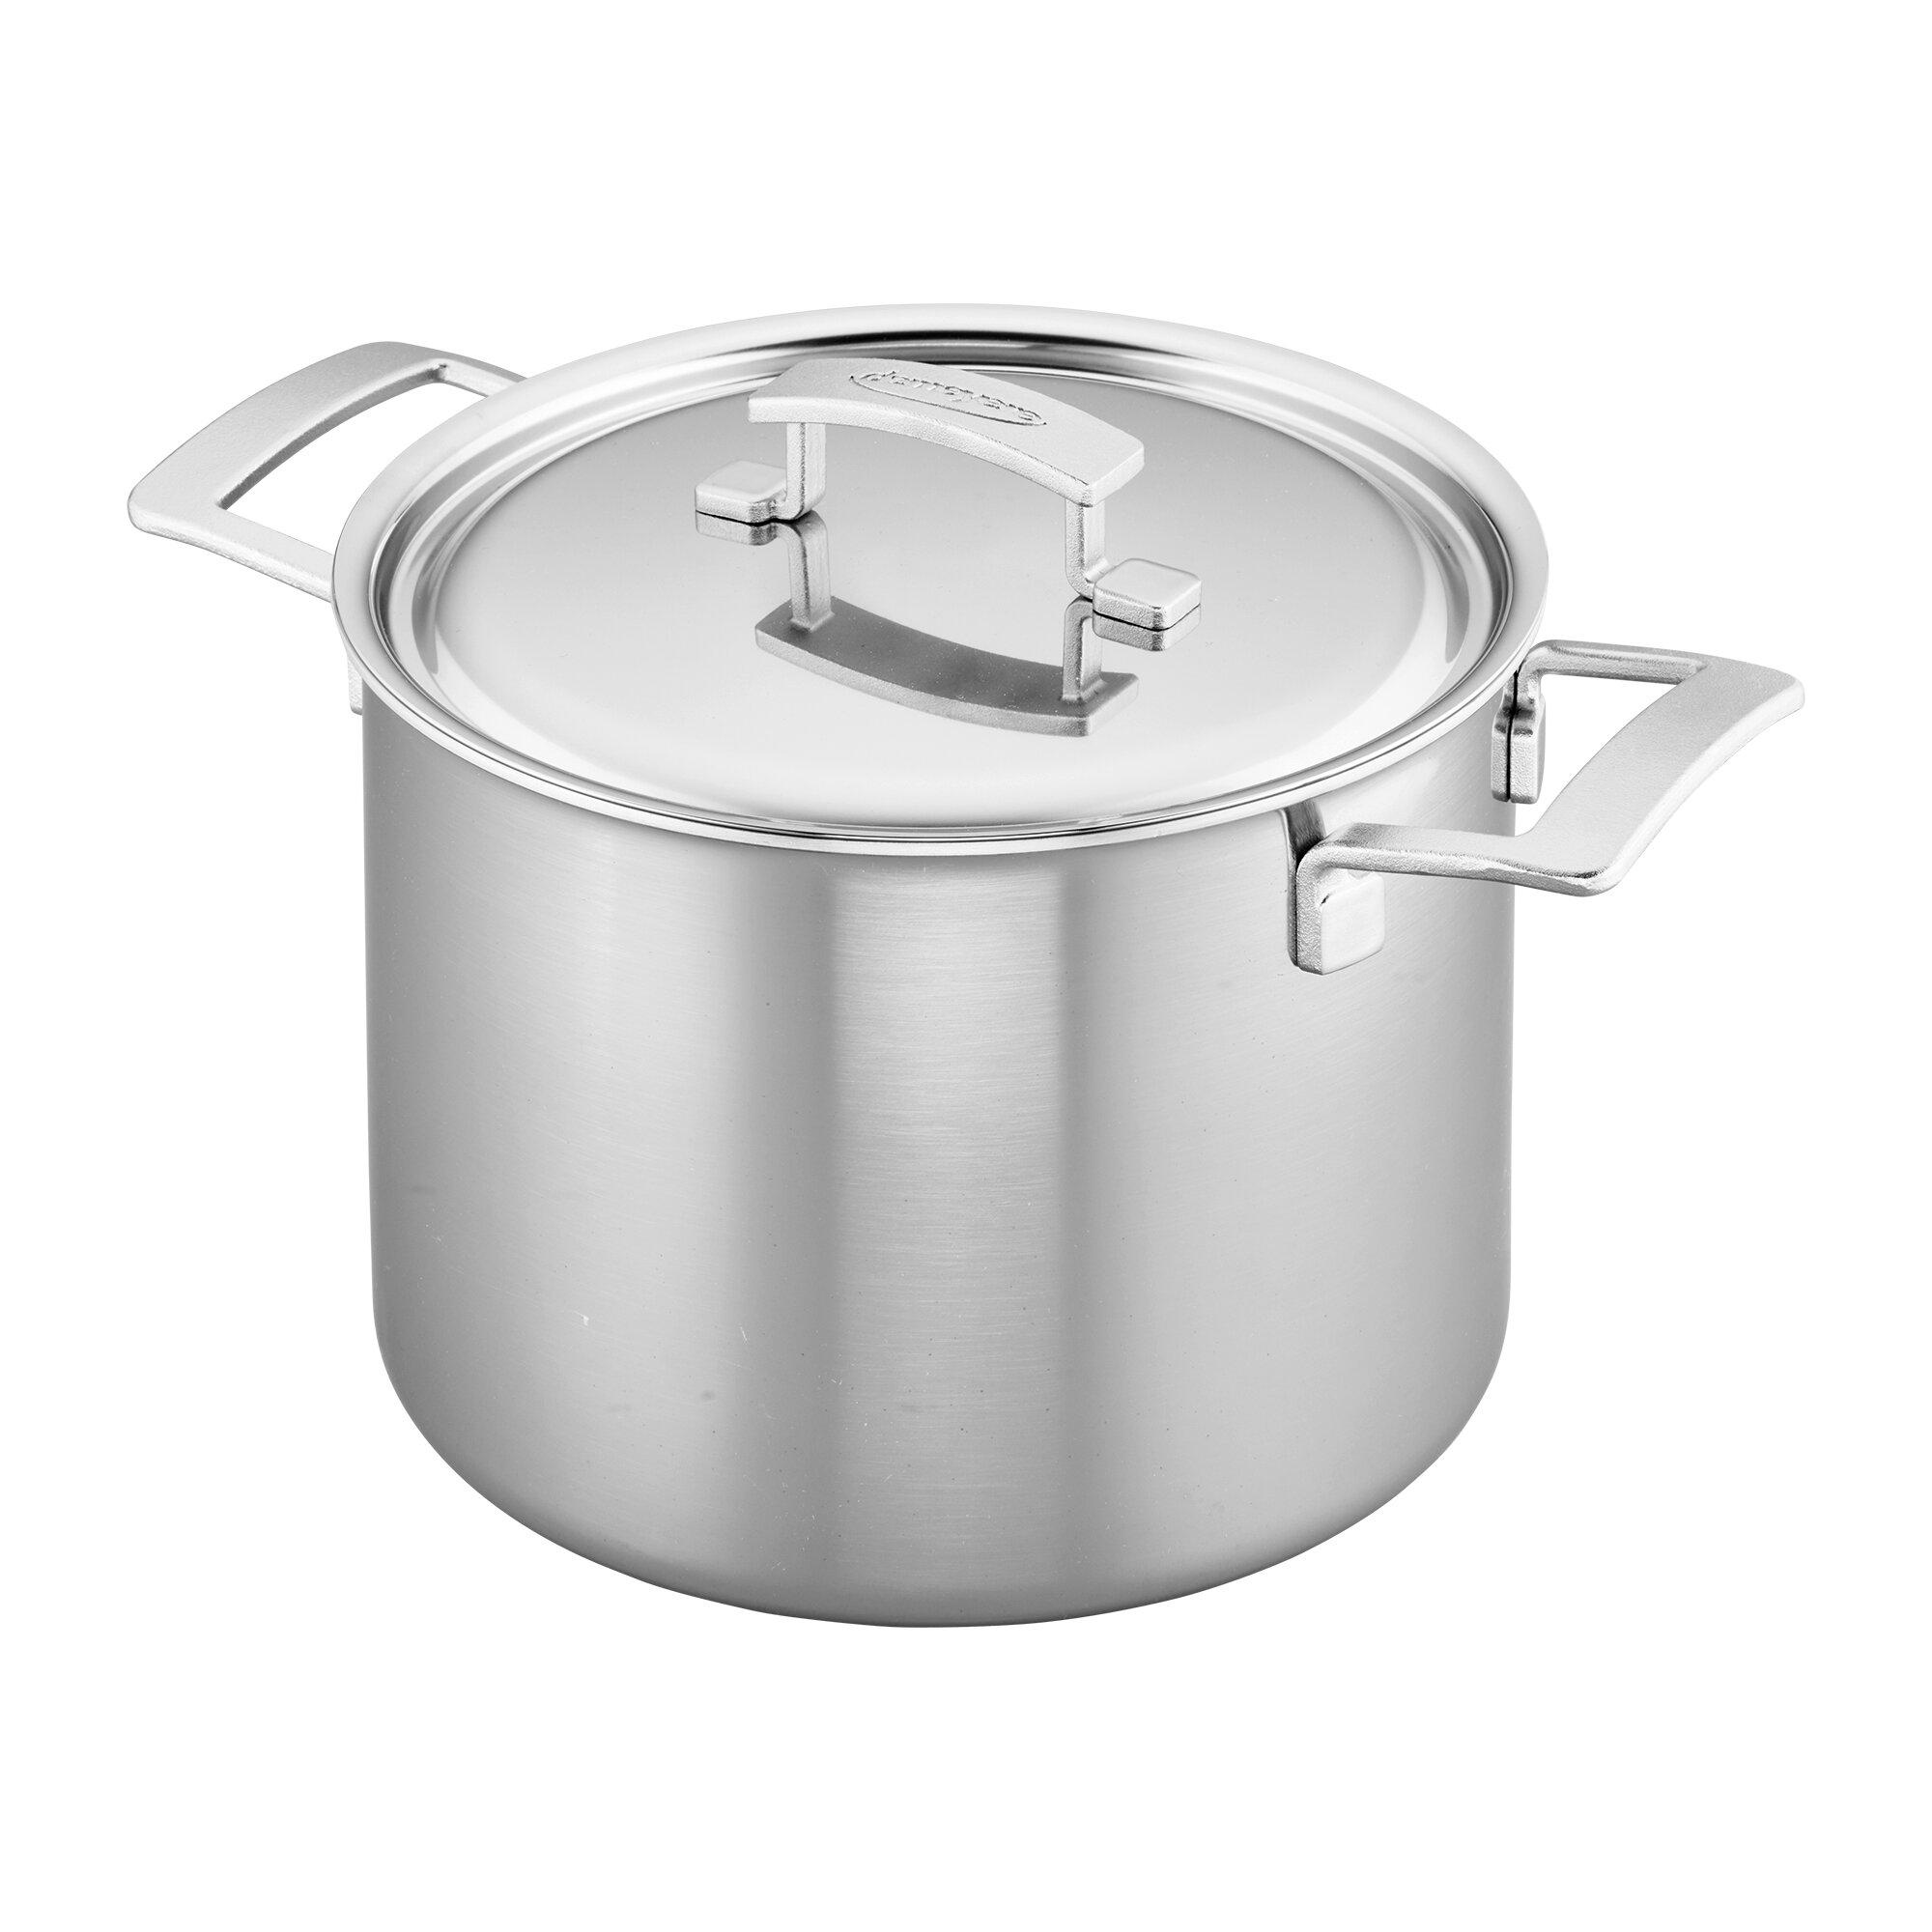 Demeyere Industry 5 Ply 8 Qt Stock Pot